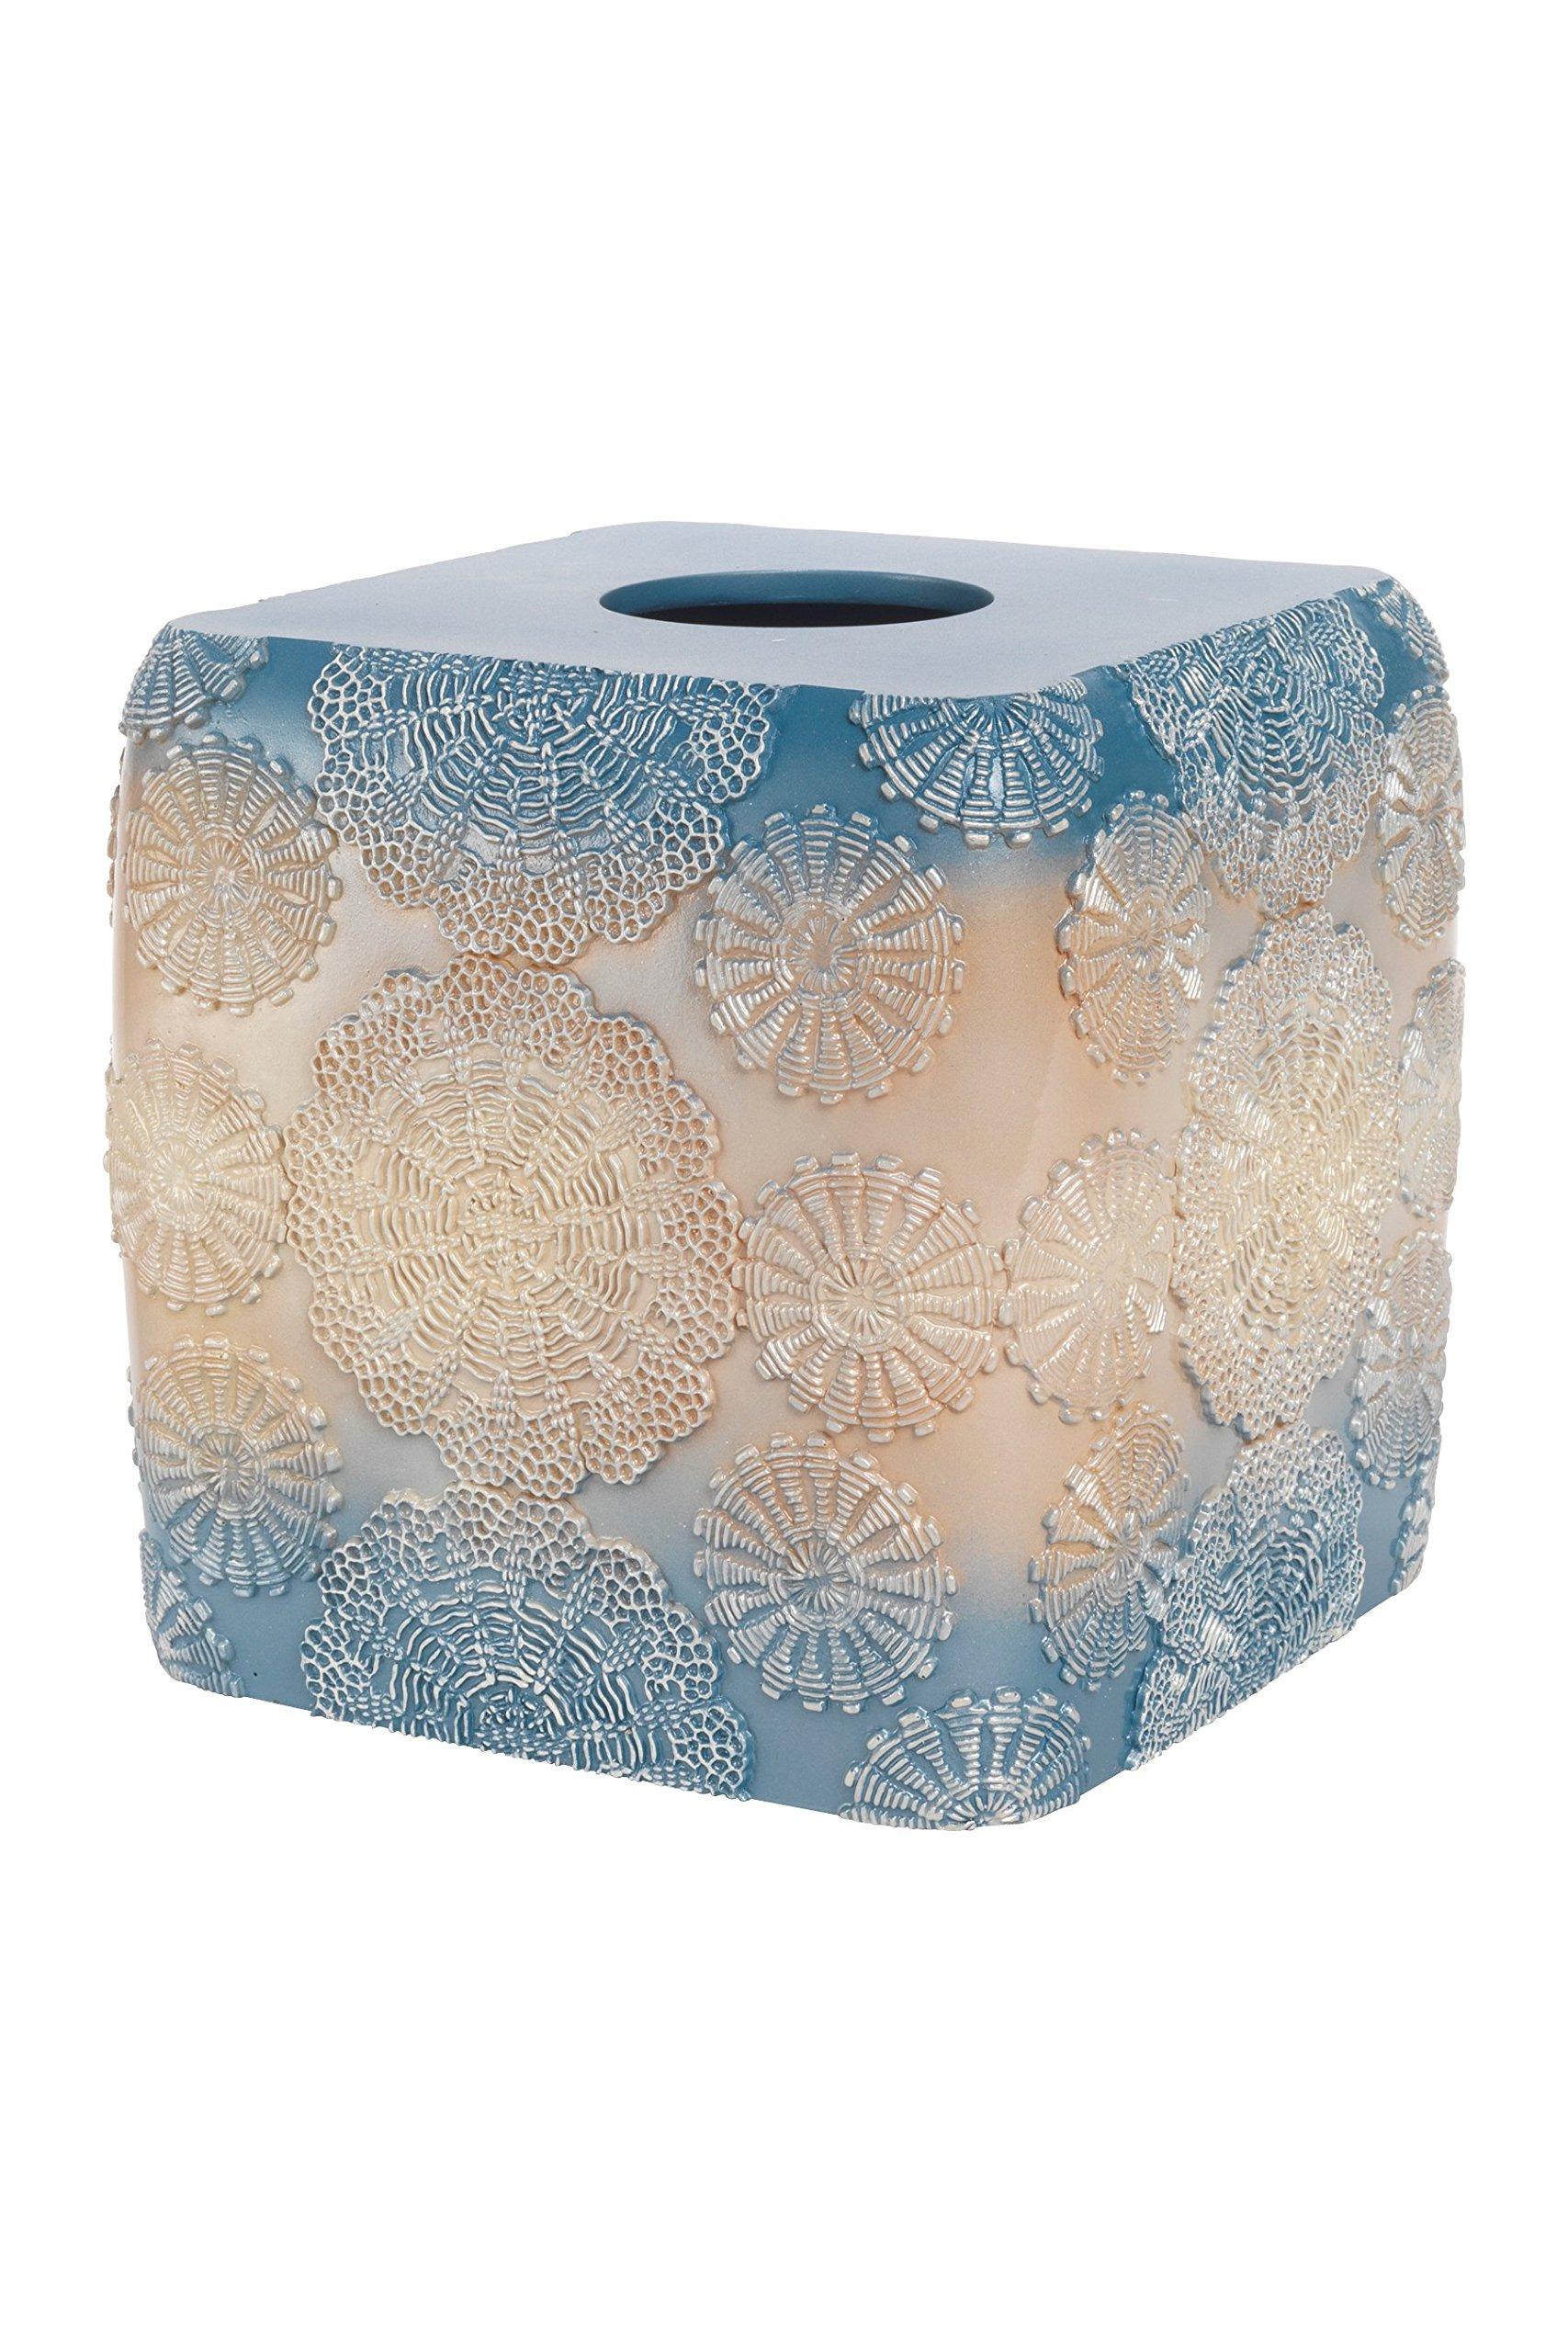 Popular Bath Tissue Box, Fallon Collection, Teal/Beige